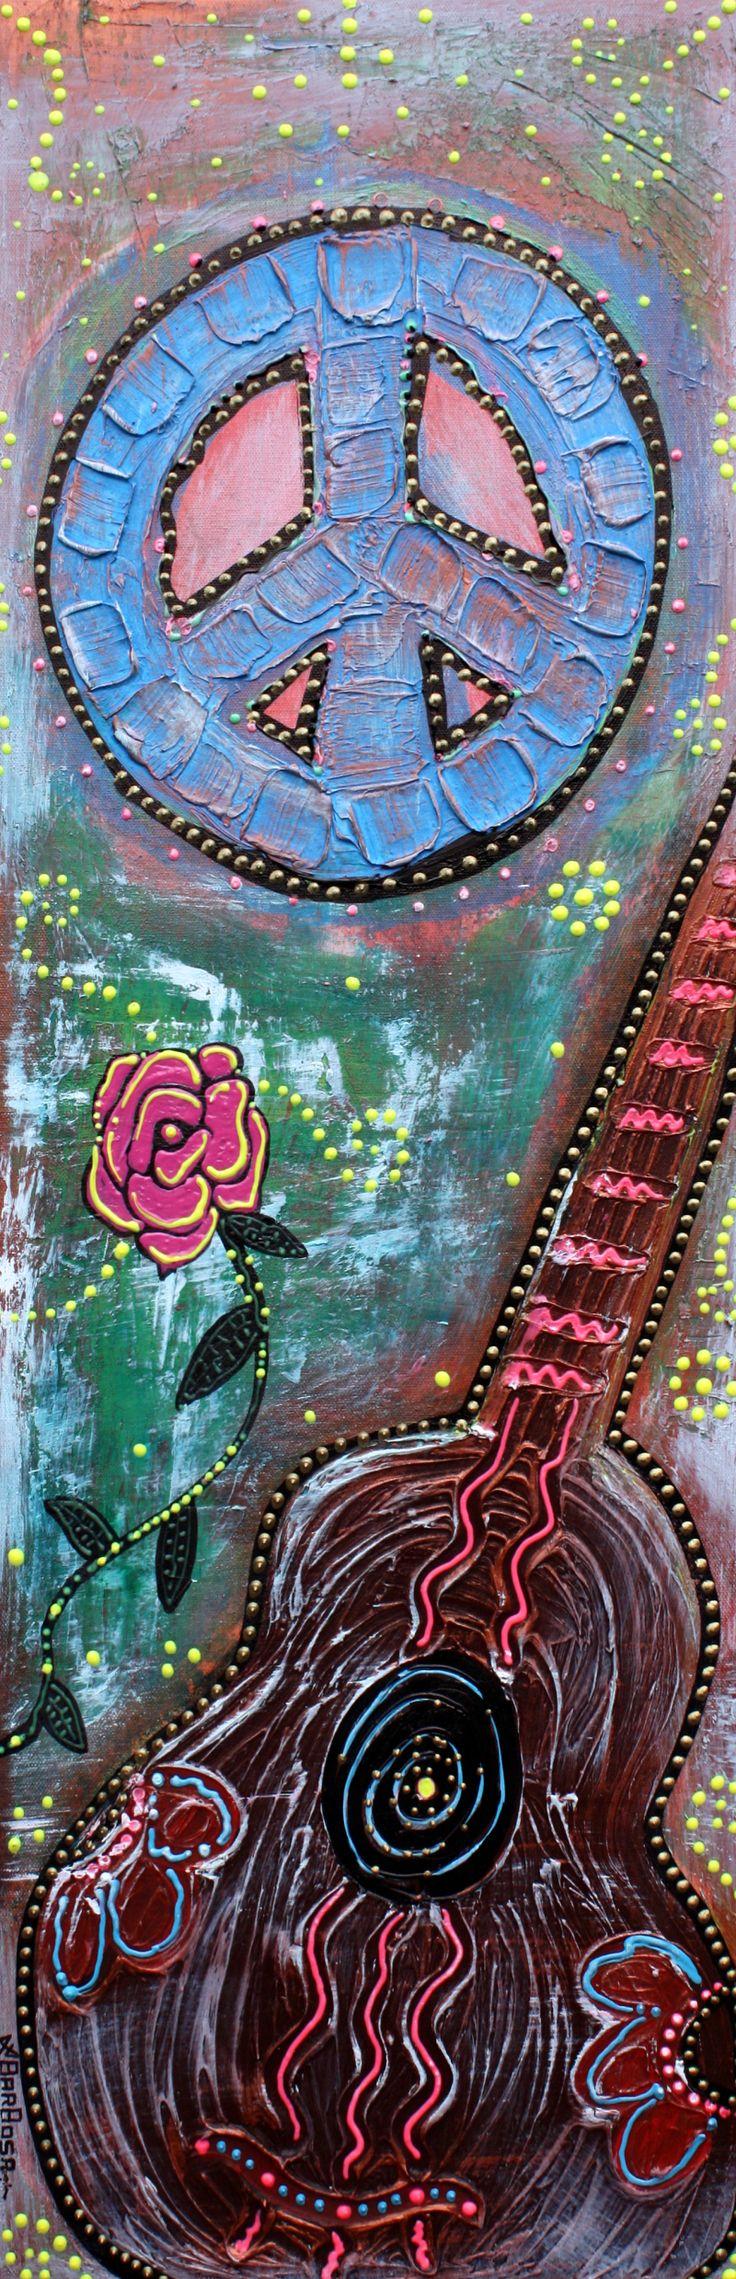 Bohemian Peace 1 by Laura Barbosa - Mixed Media ART - Canvas Guitar